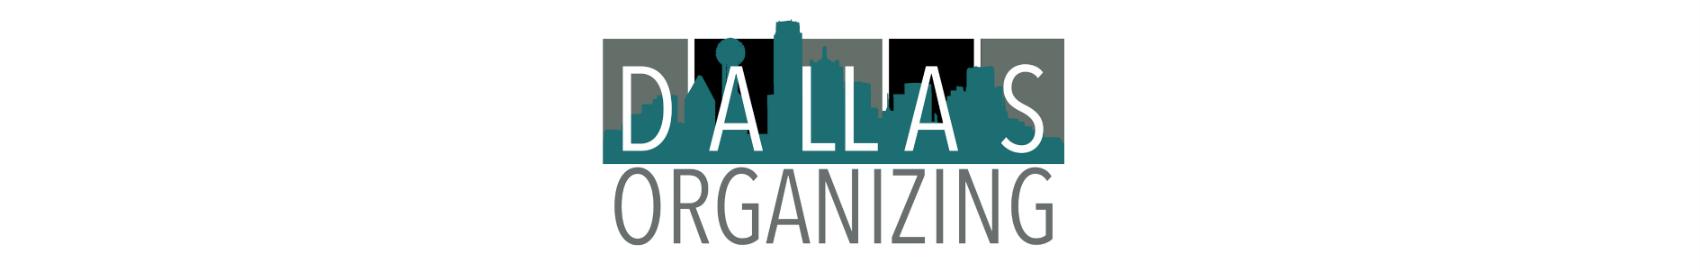 Dallas Organizing